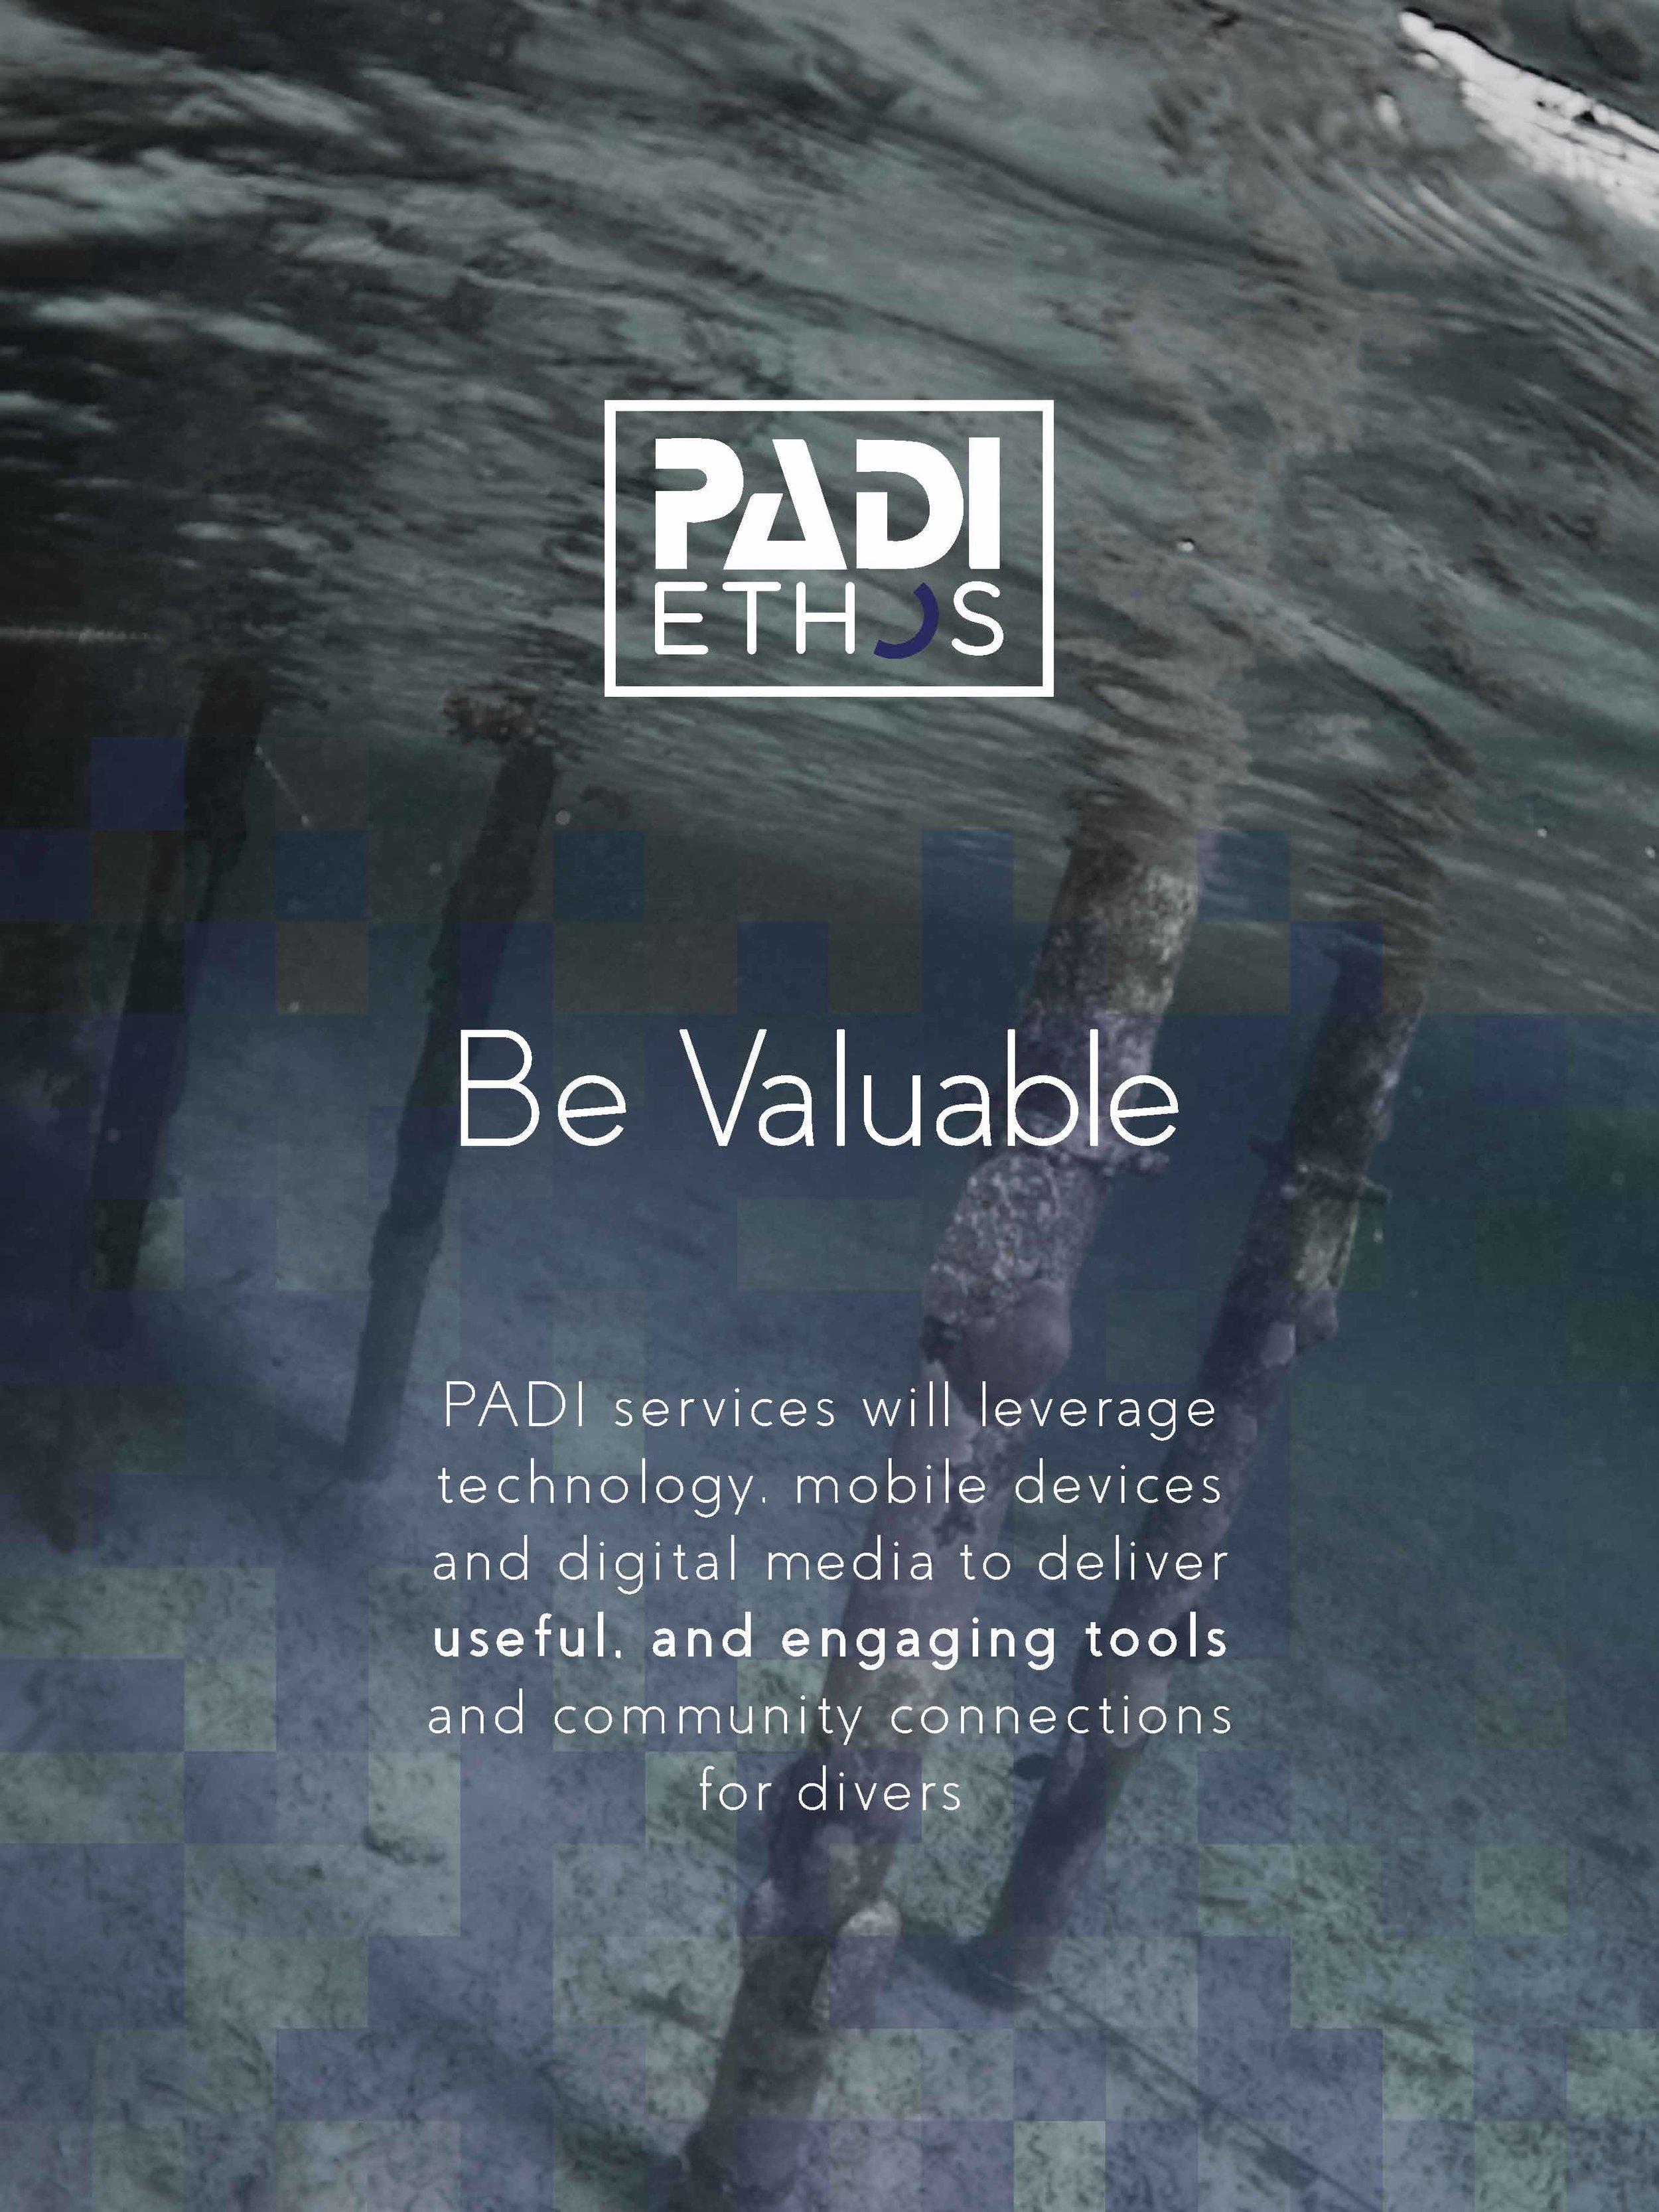 PADI_Ethos_Page_3.jpg